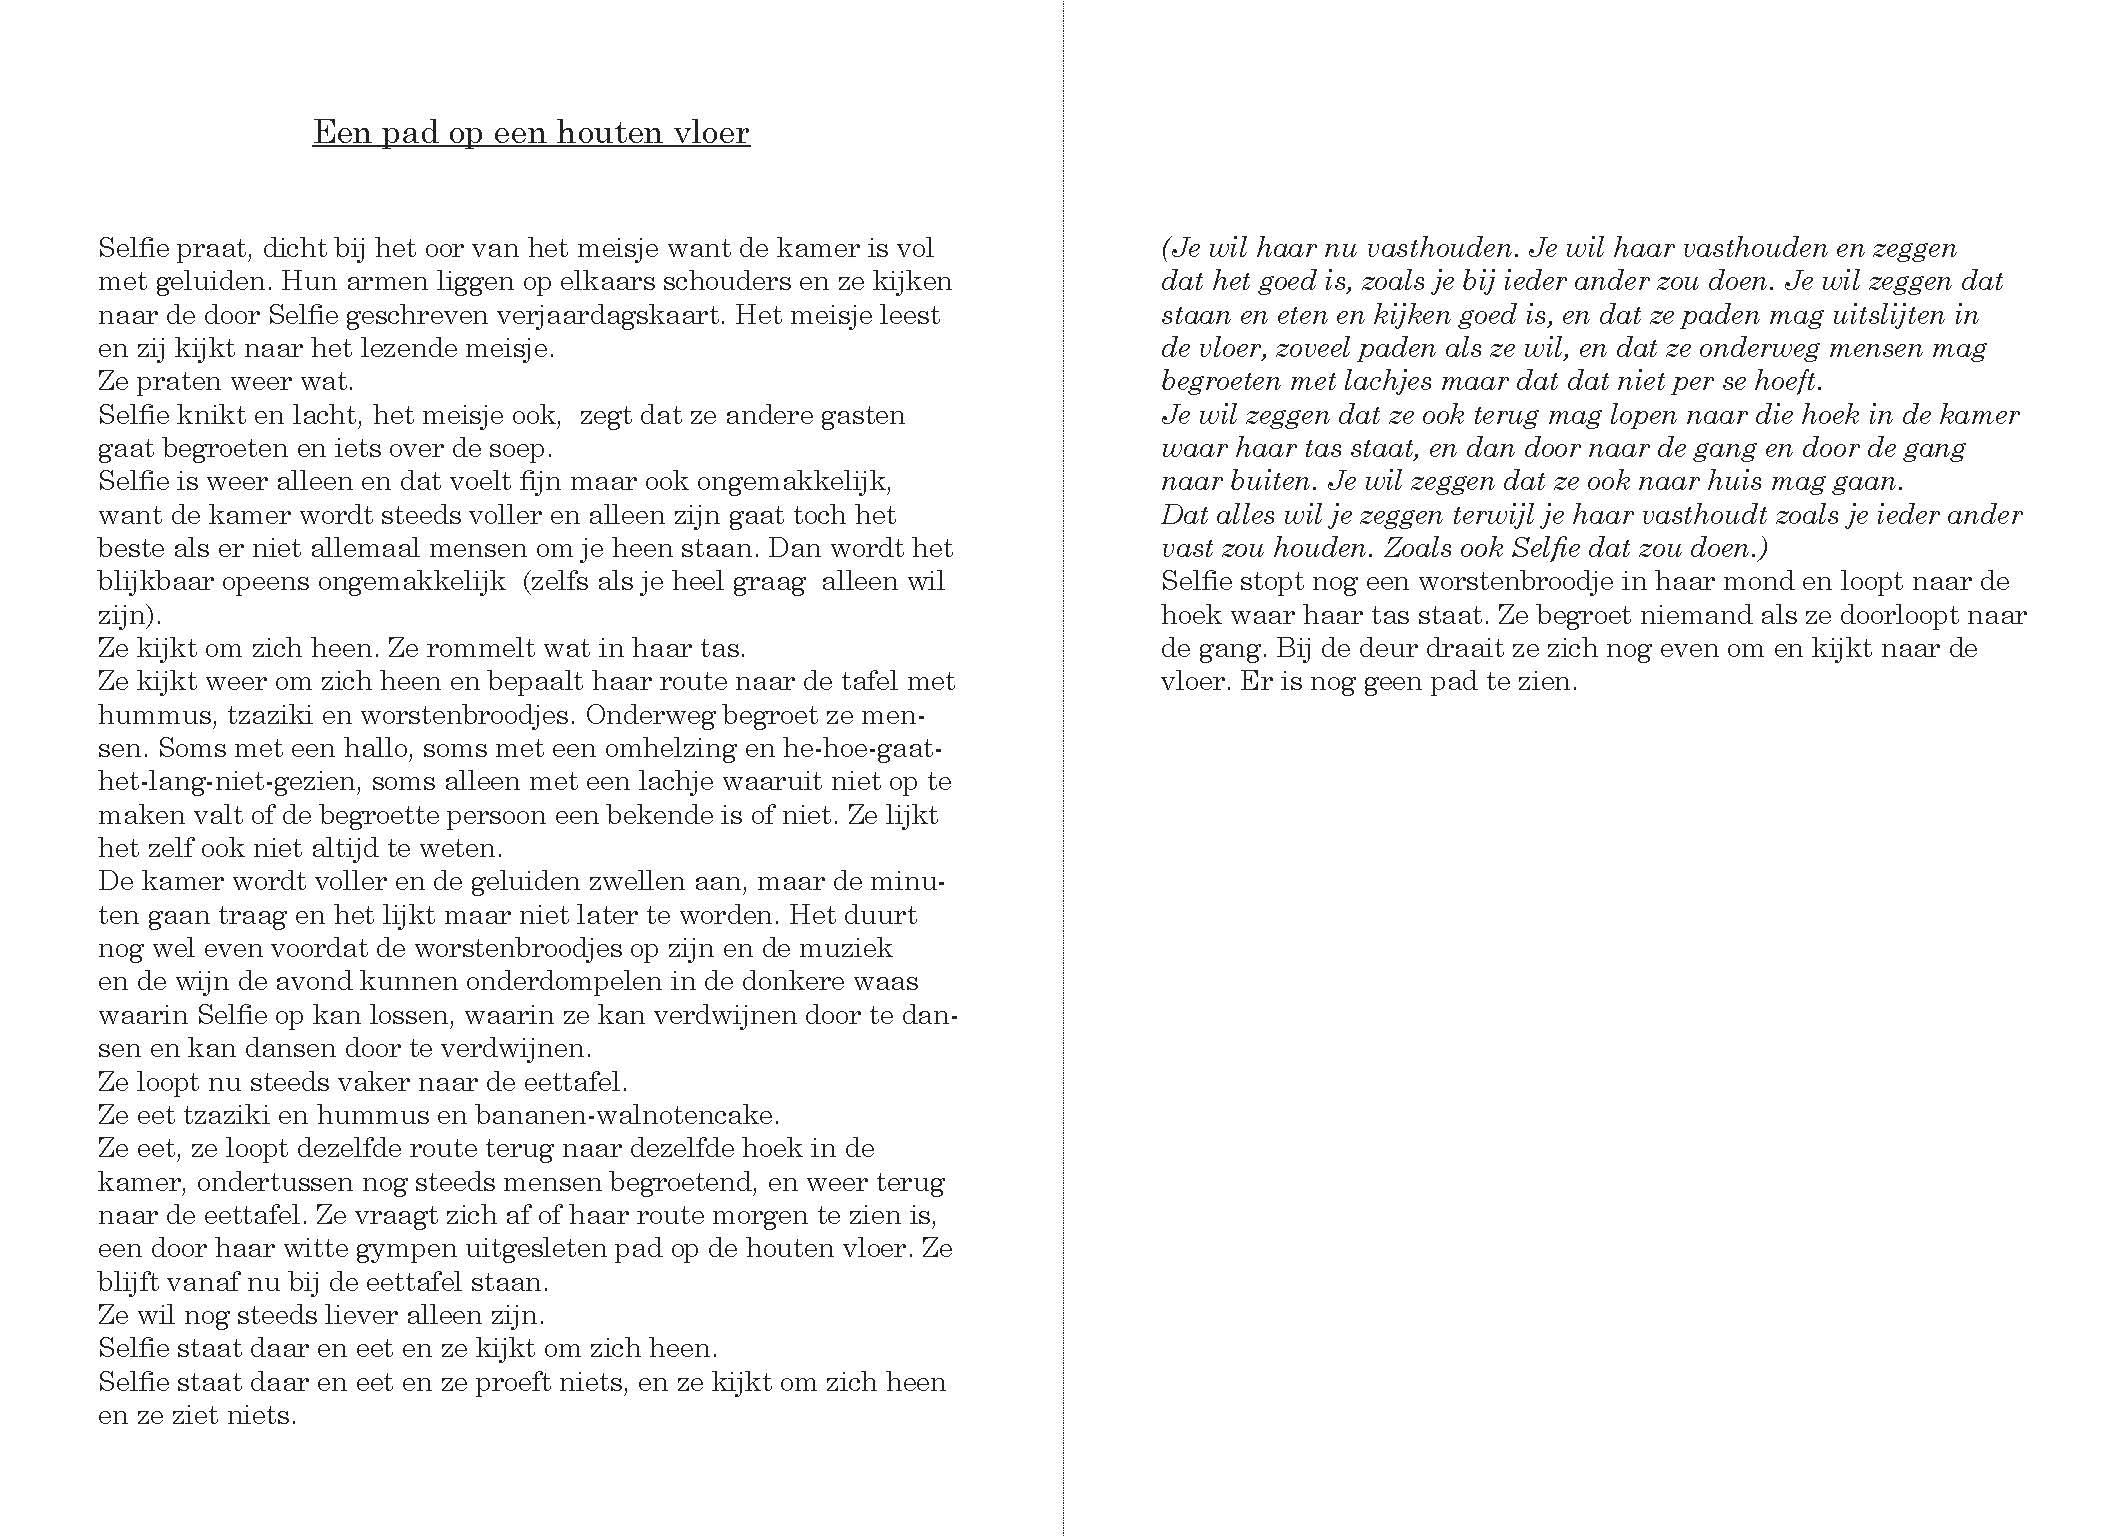 Manuscript-Selfie-YildauterBeek-Lang_Pagina_43.jpg